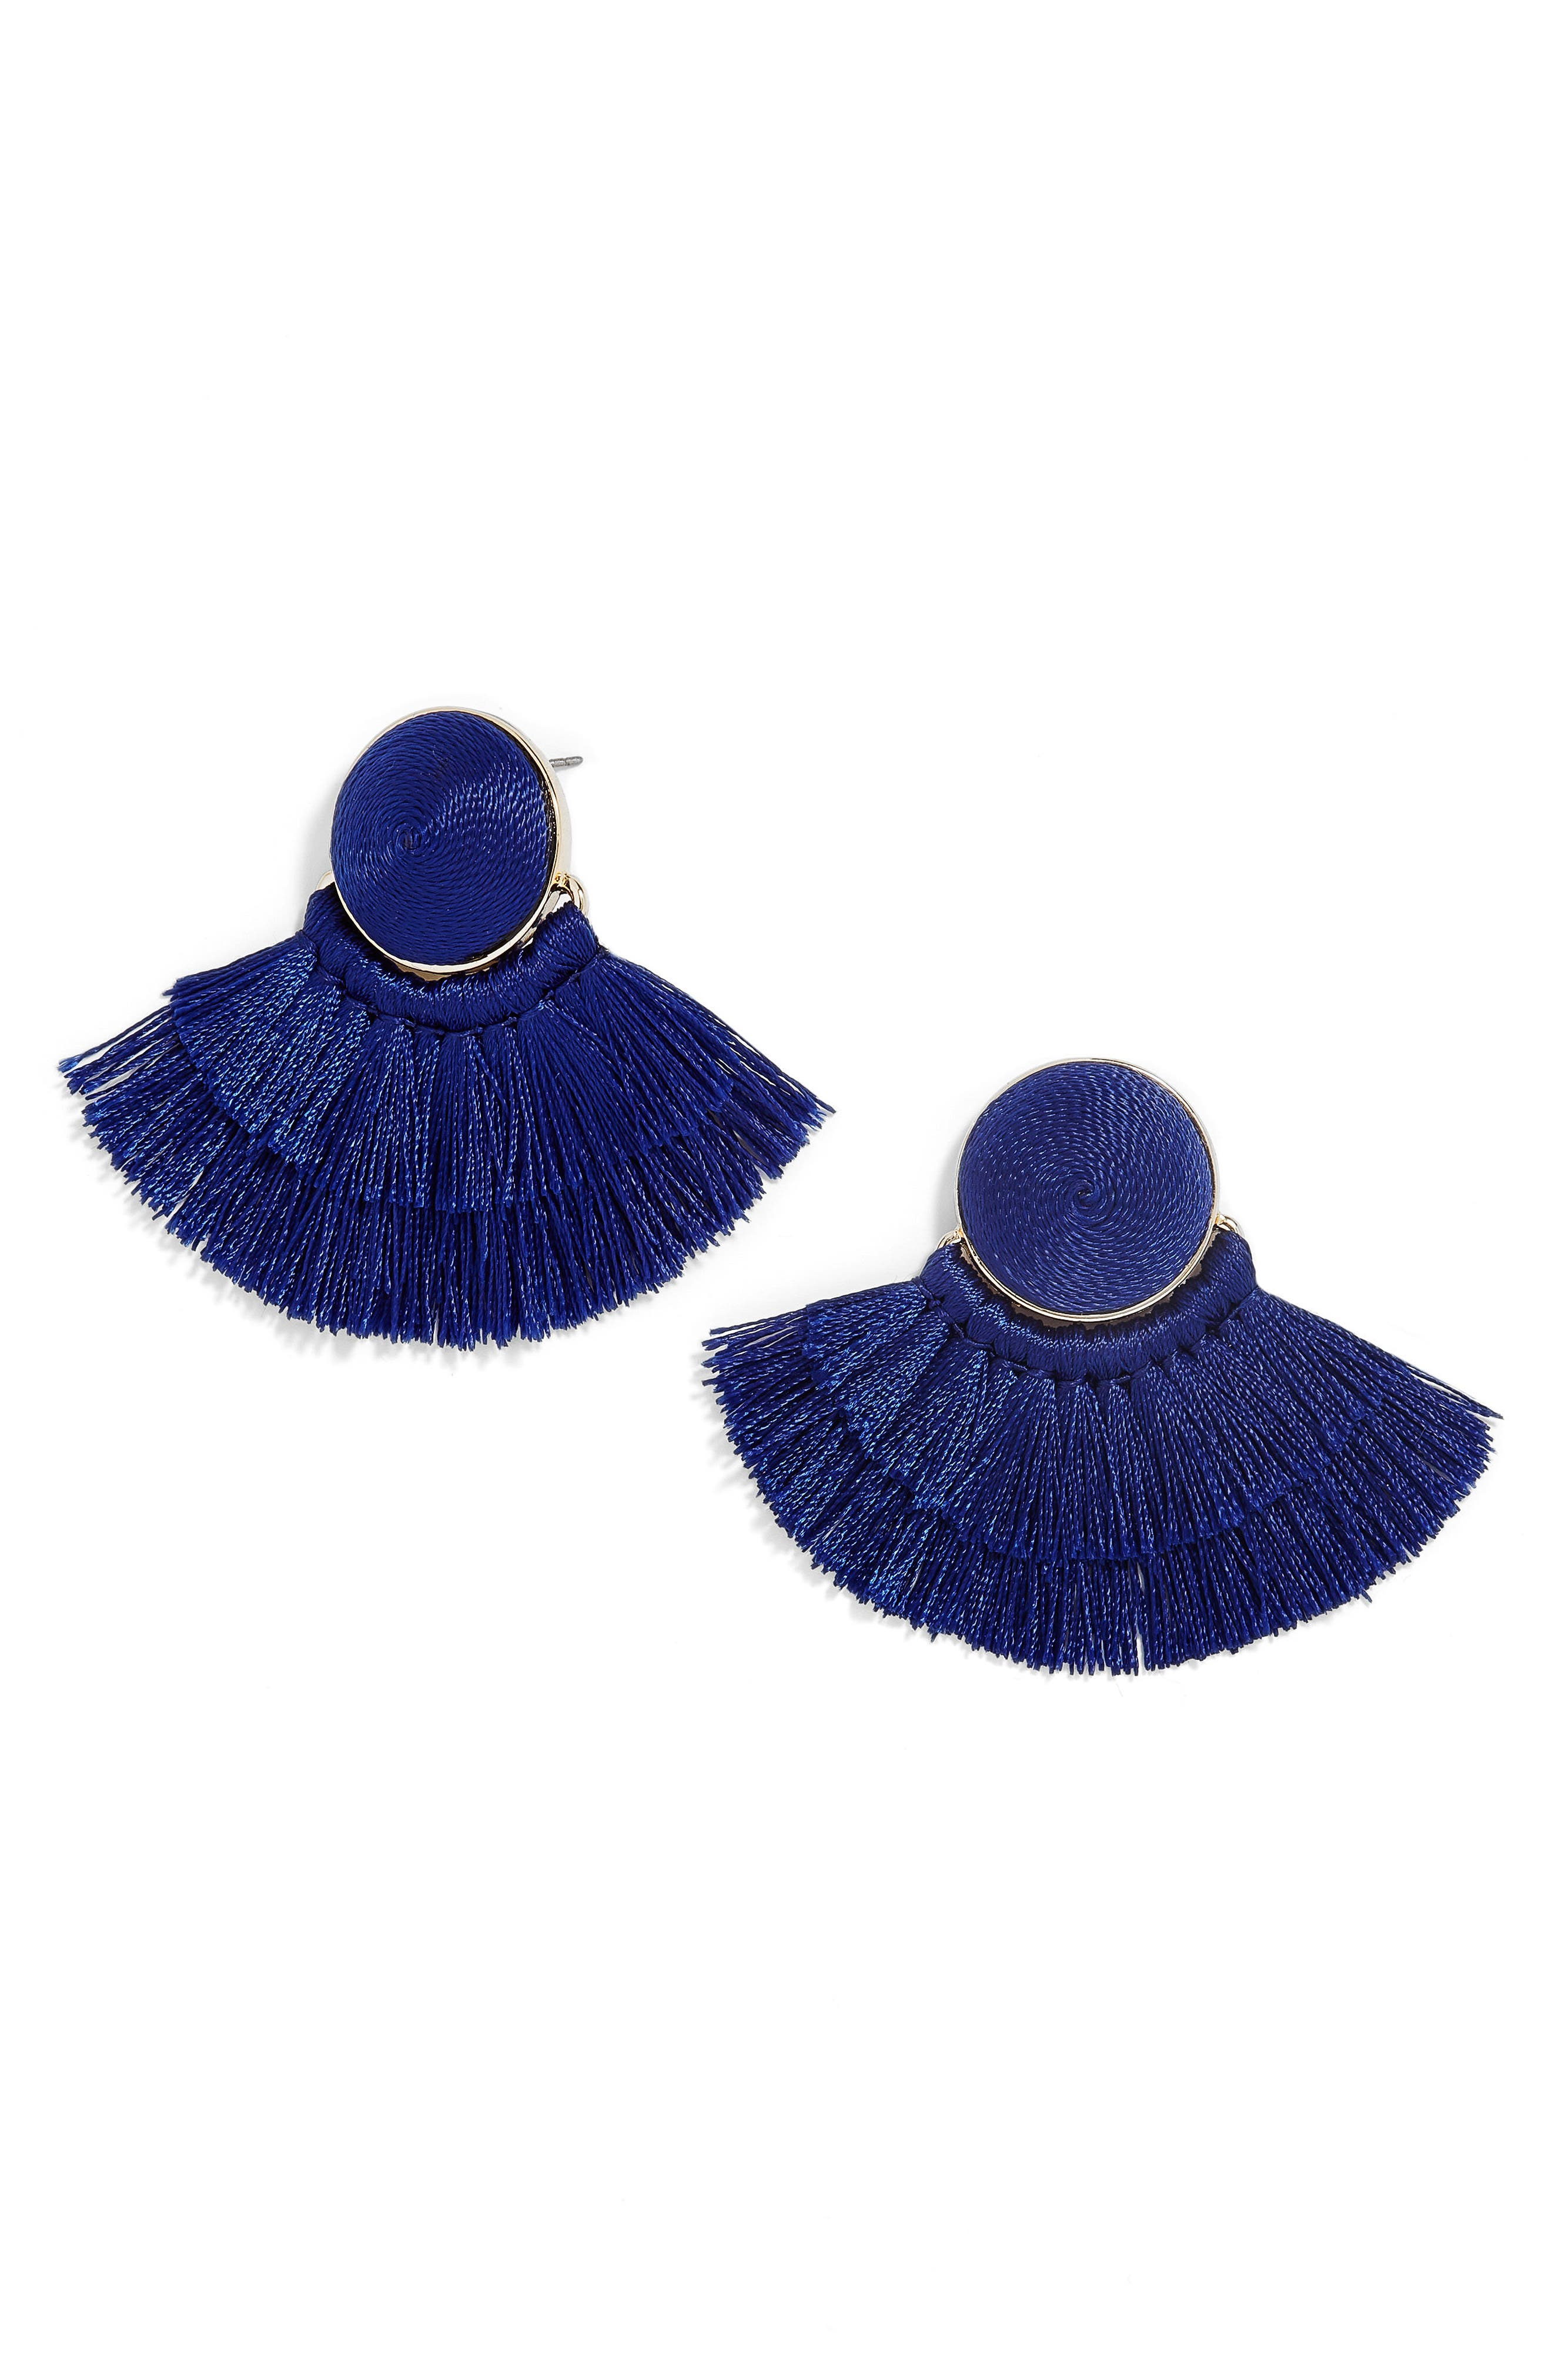 Martina Chubby Deco Fringe Drop Earrings,                         Main,                         color, 400